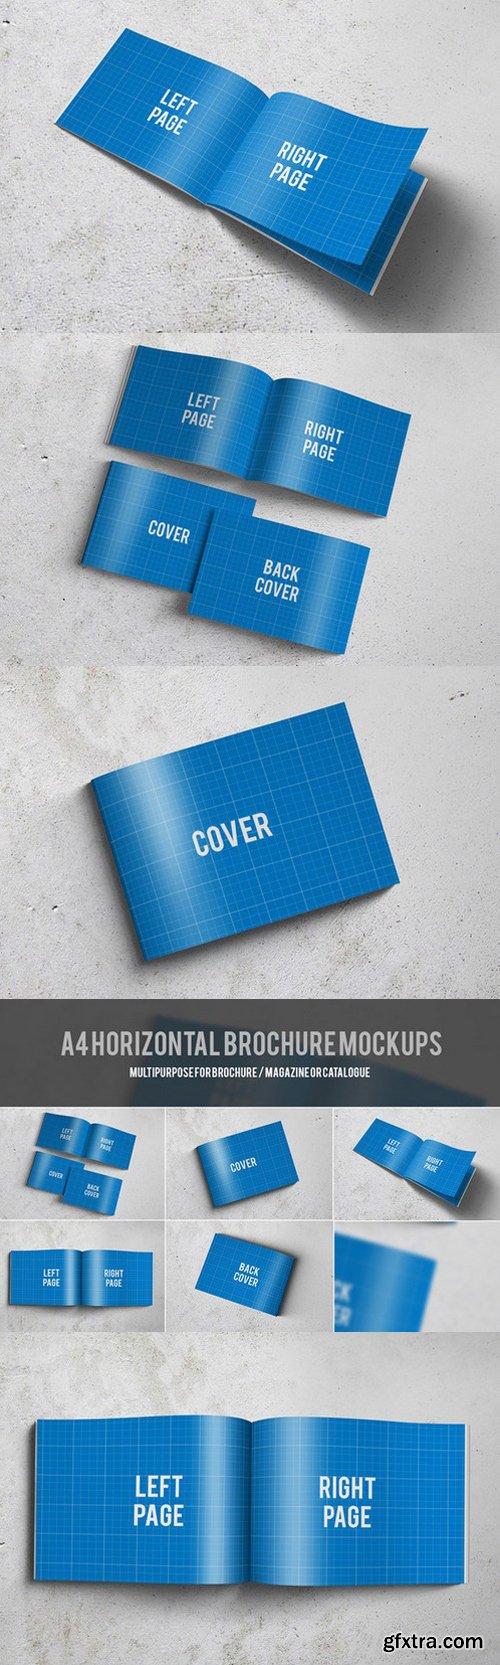 CM - A4 Horizontal Brochure Mockups 181402